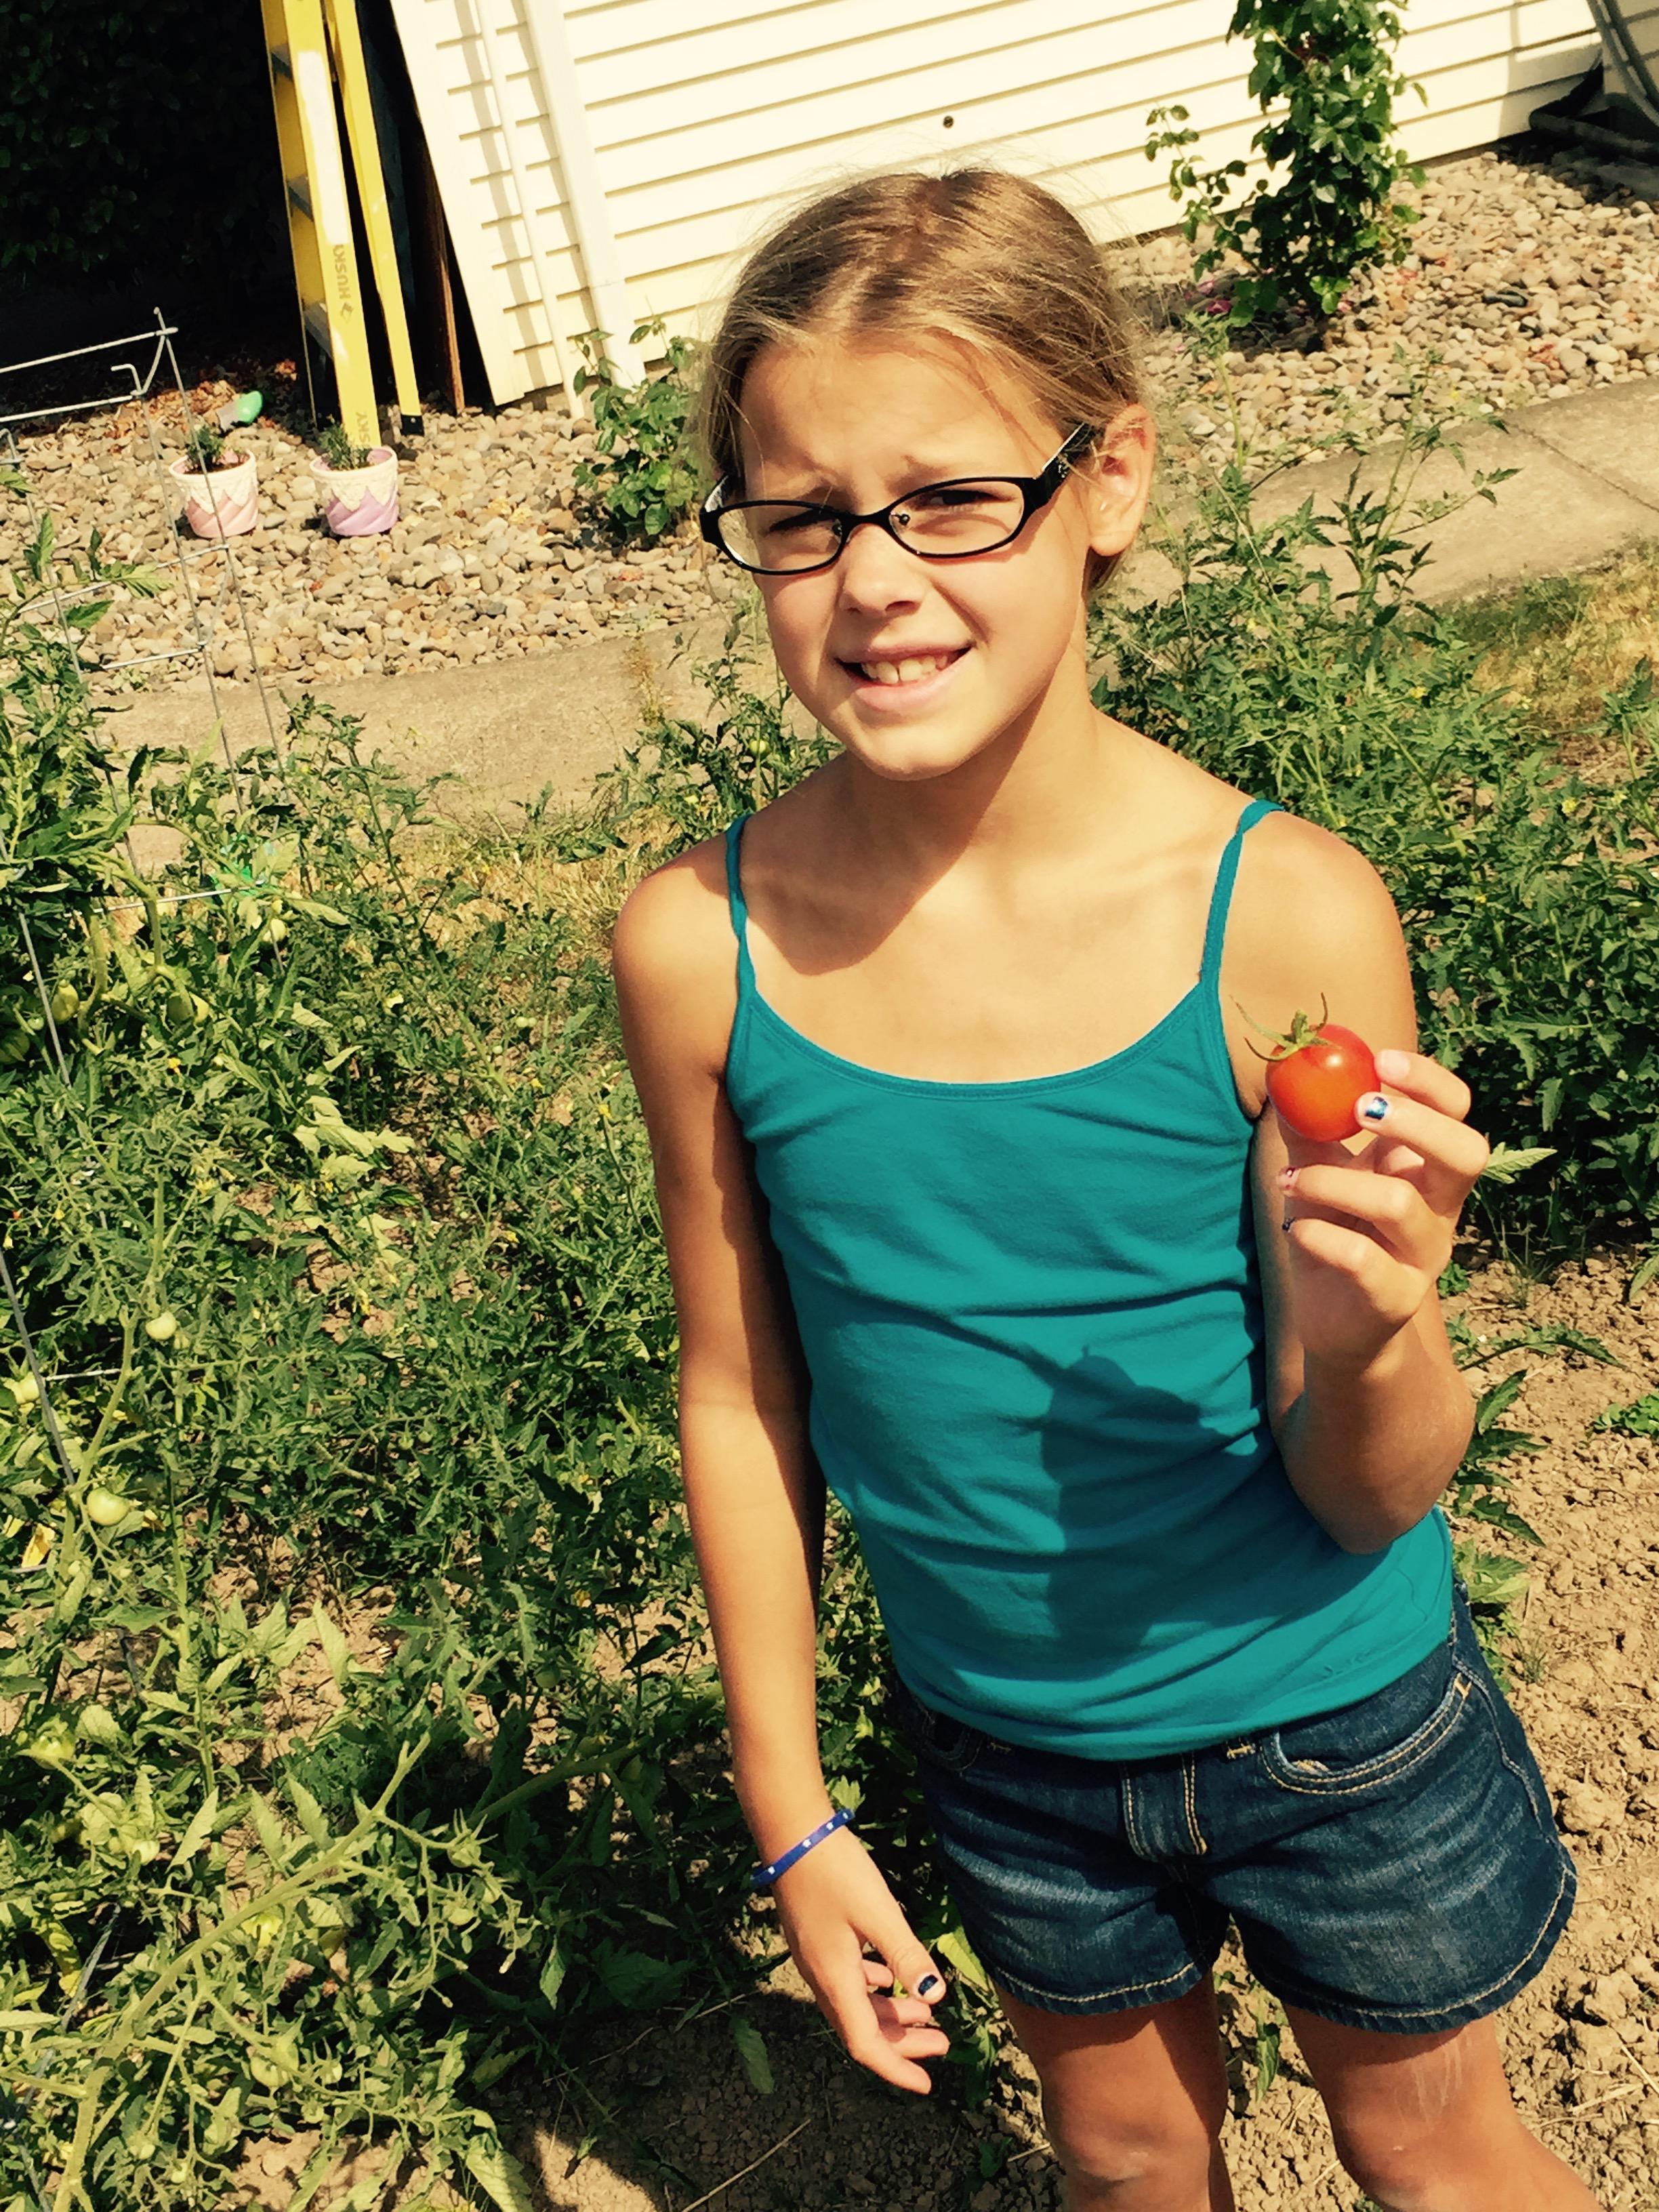 Rylee, age 9 (photo provided by C. Killian)